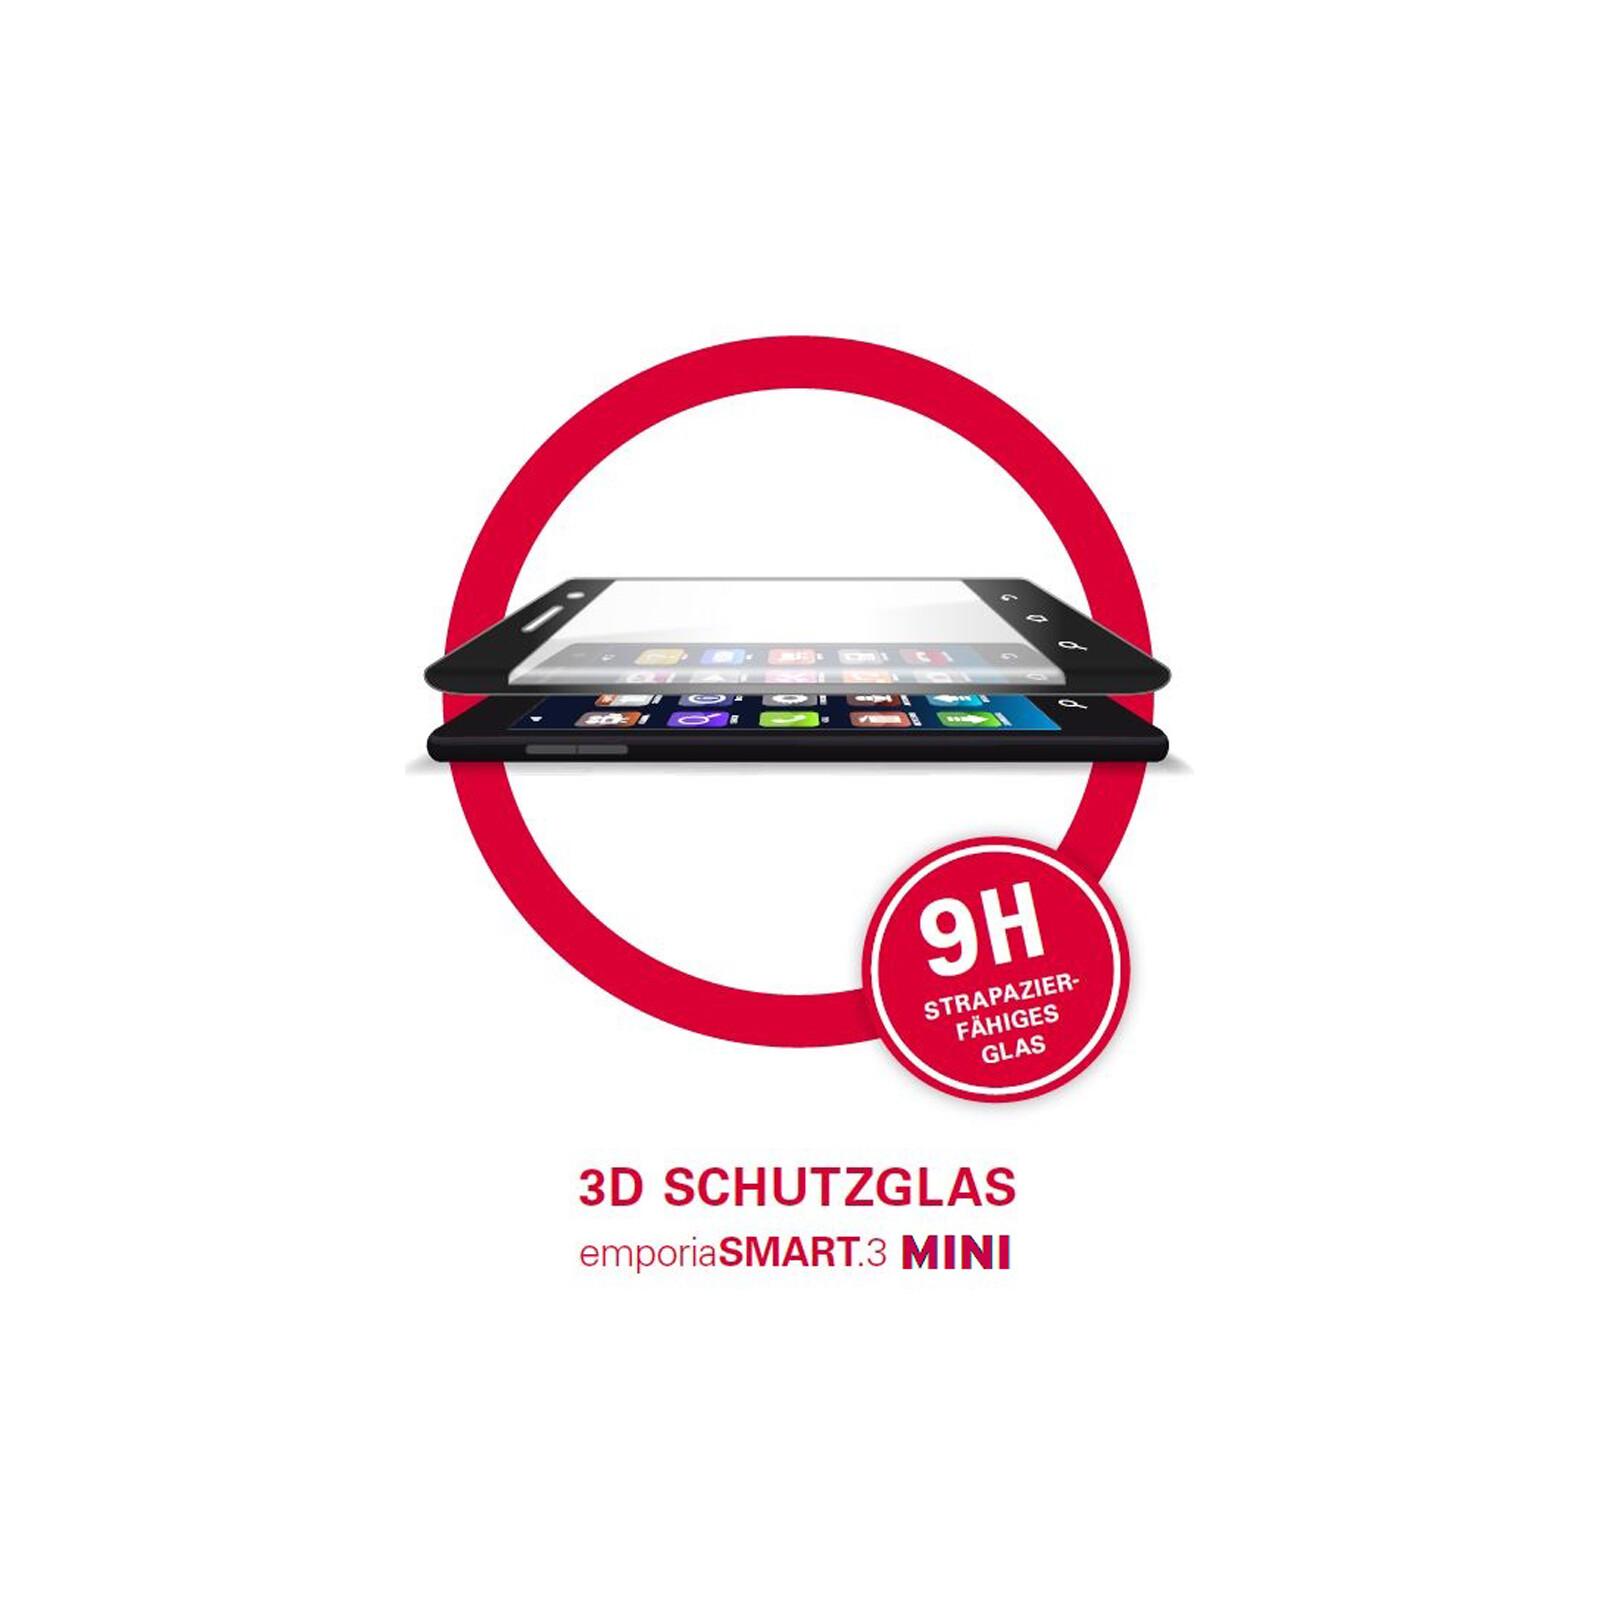 Emporia Displayschutzglas Smart 3 mini